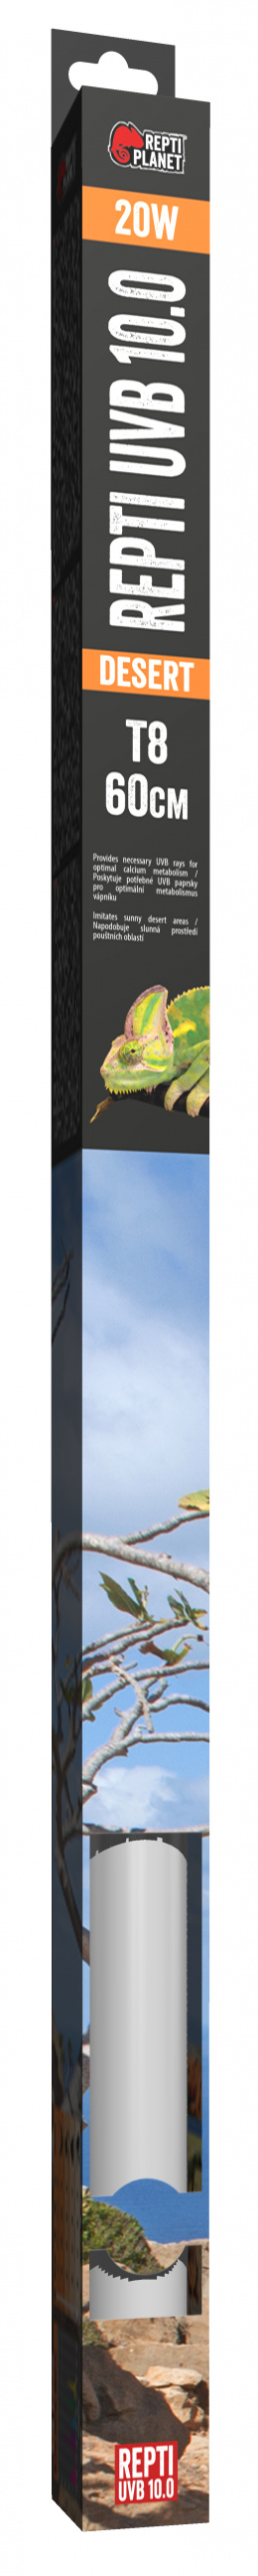 Spuldze terārija lampai - ReptiPlanet Repti T8 UVB 10.0 20W, 60 cm